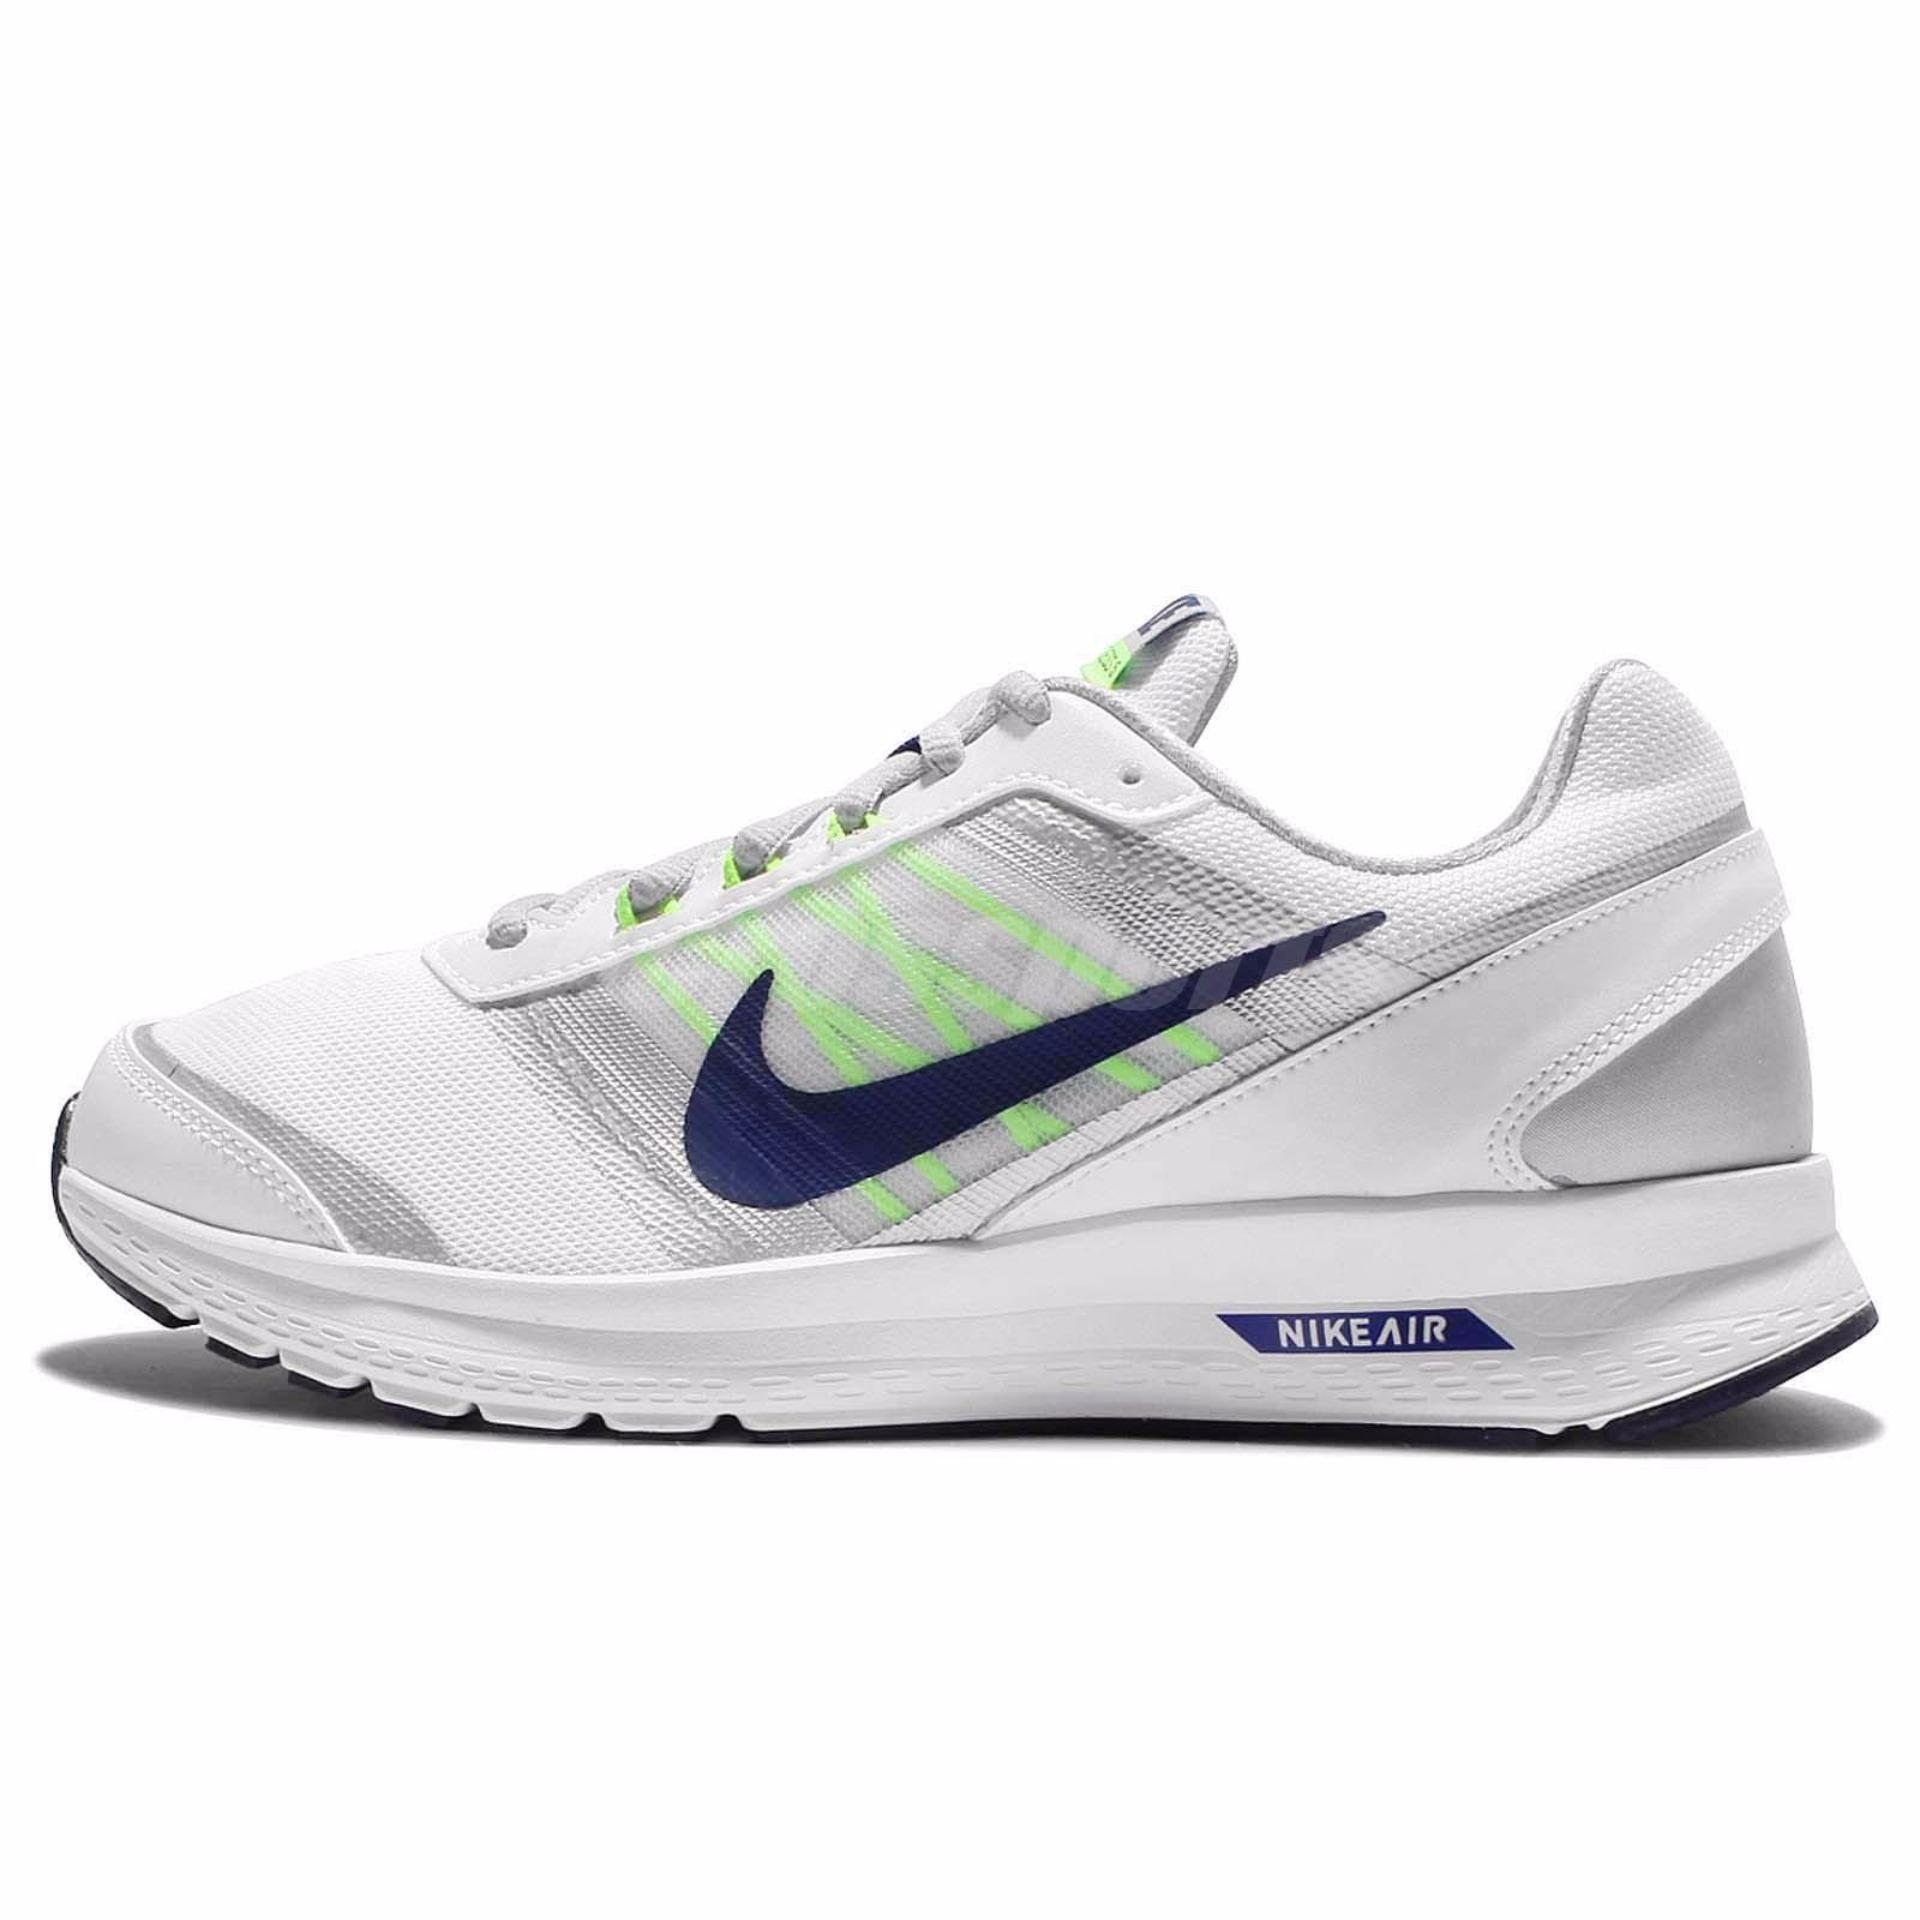 Pelacakan Harga Air Relentless 5 Msl White Loyal Blue Metallic Nike Relentless6 Hitam Putih Silver